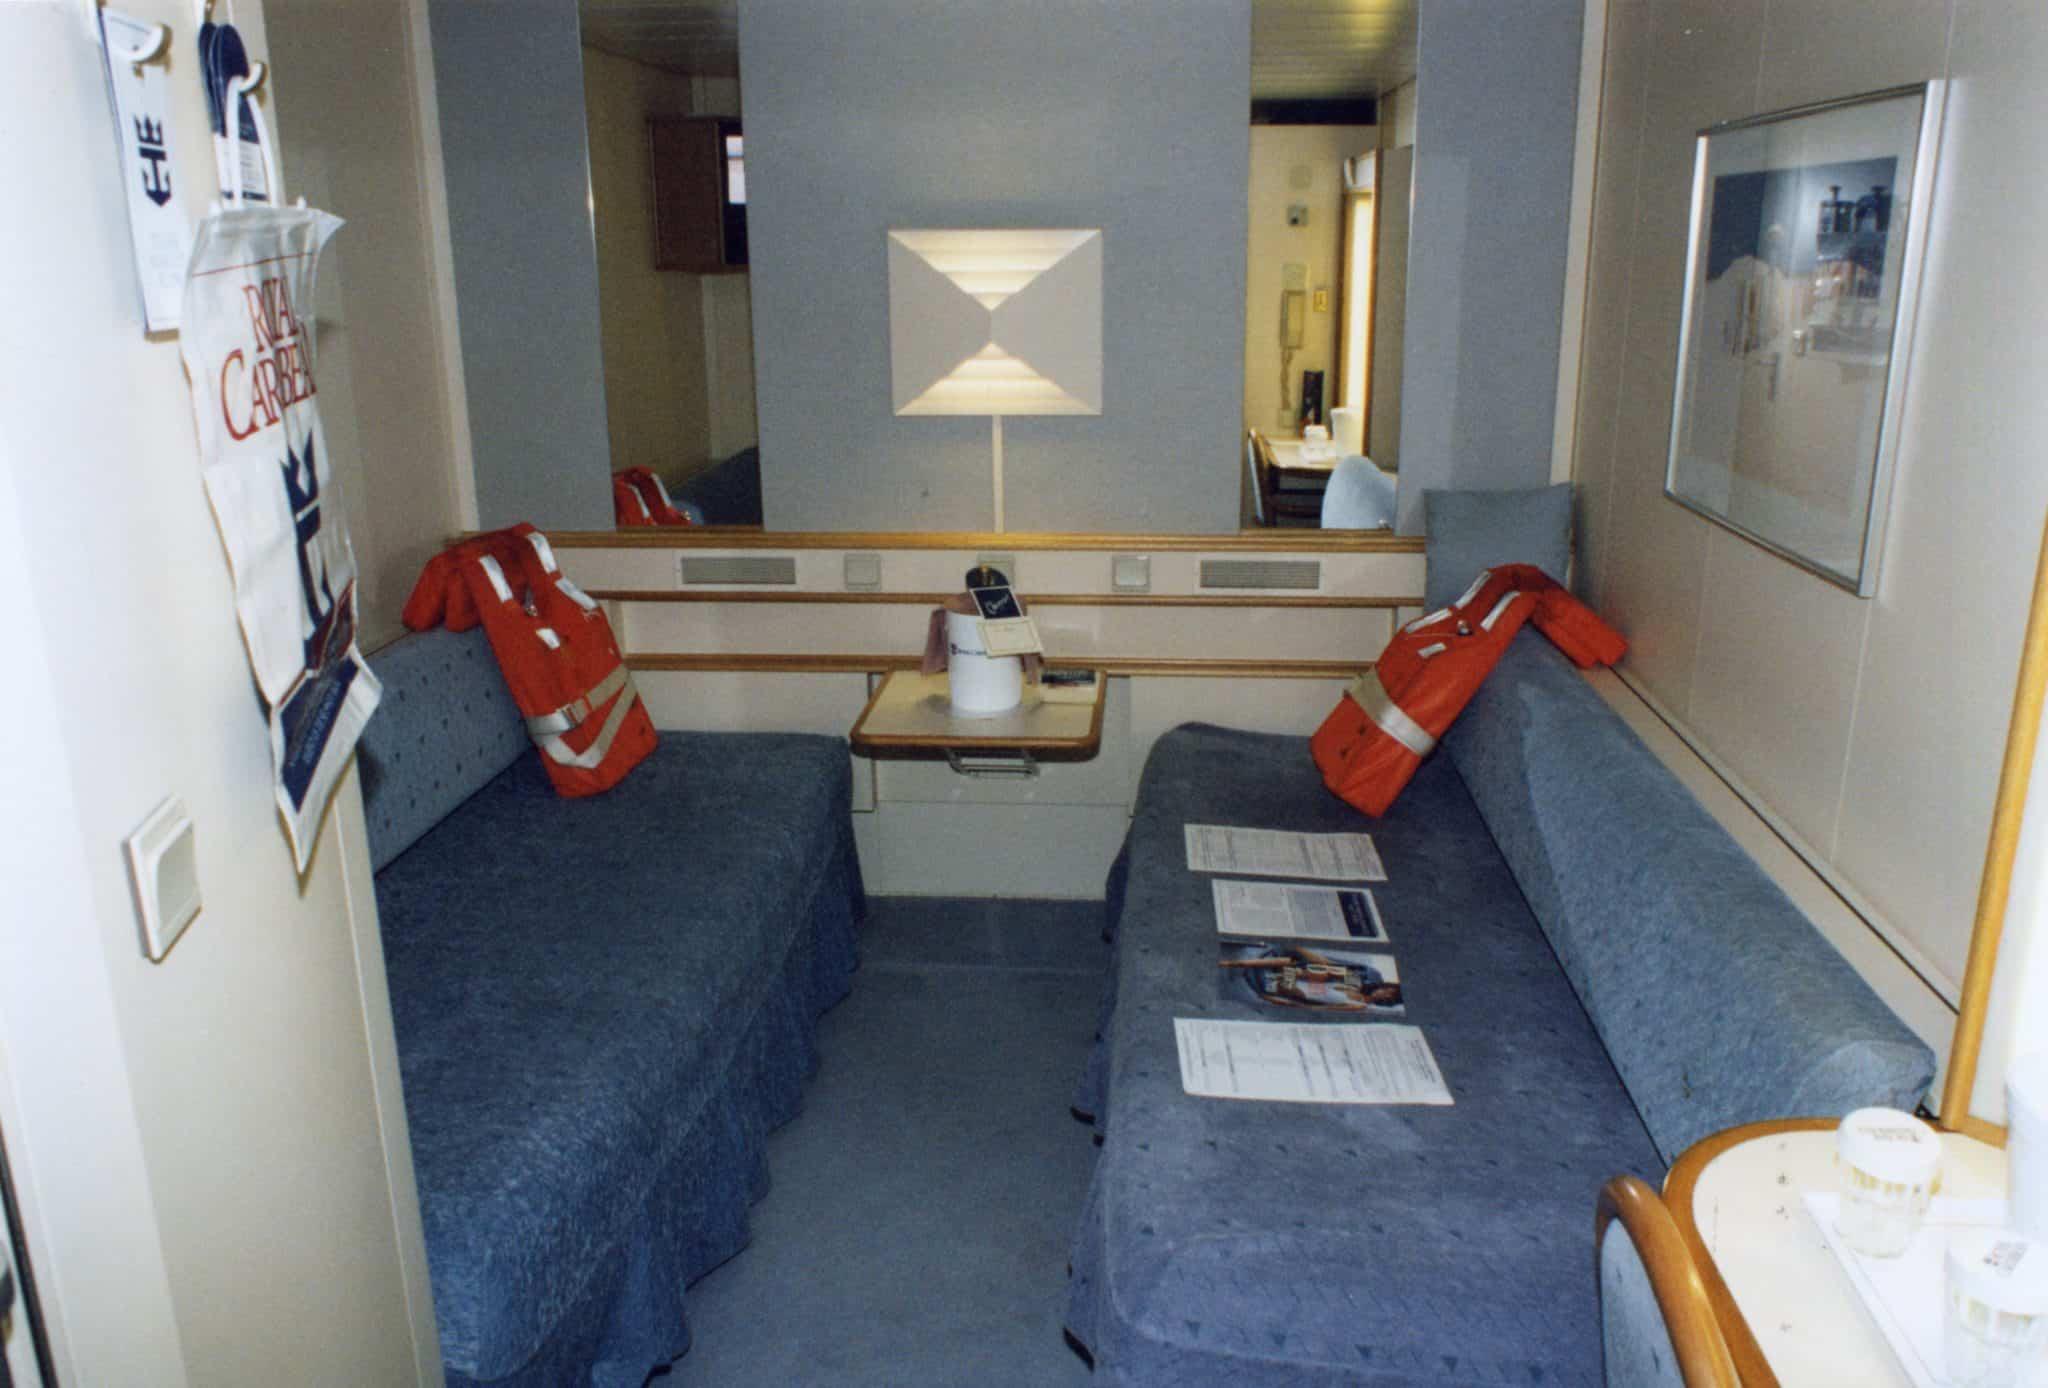 cruise line economical cabin